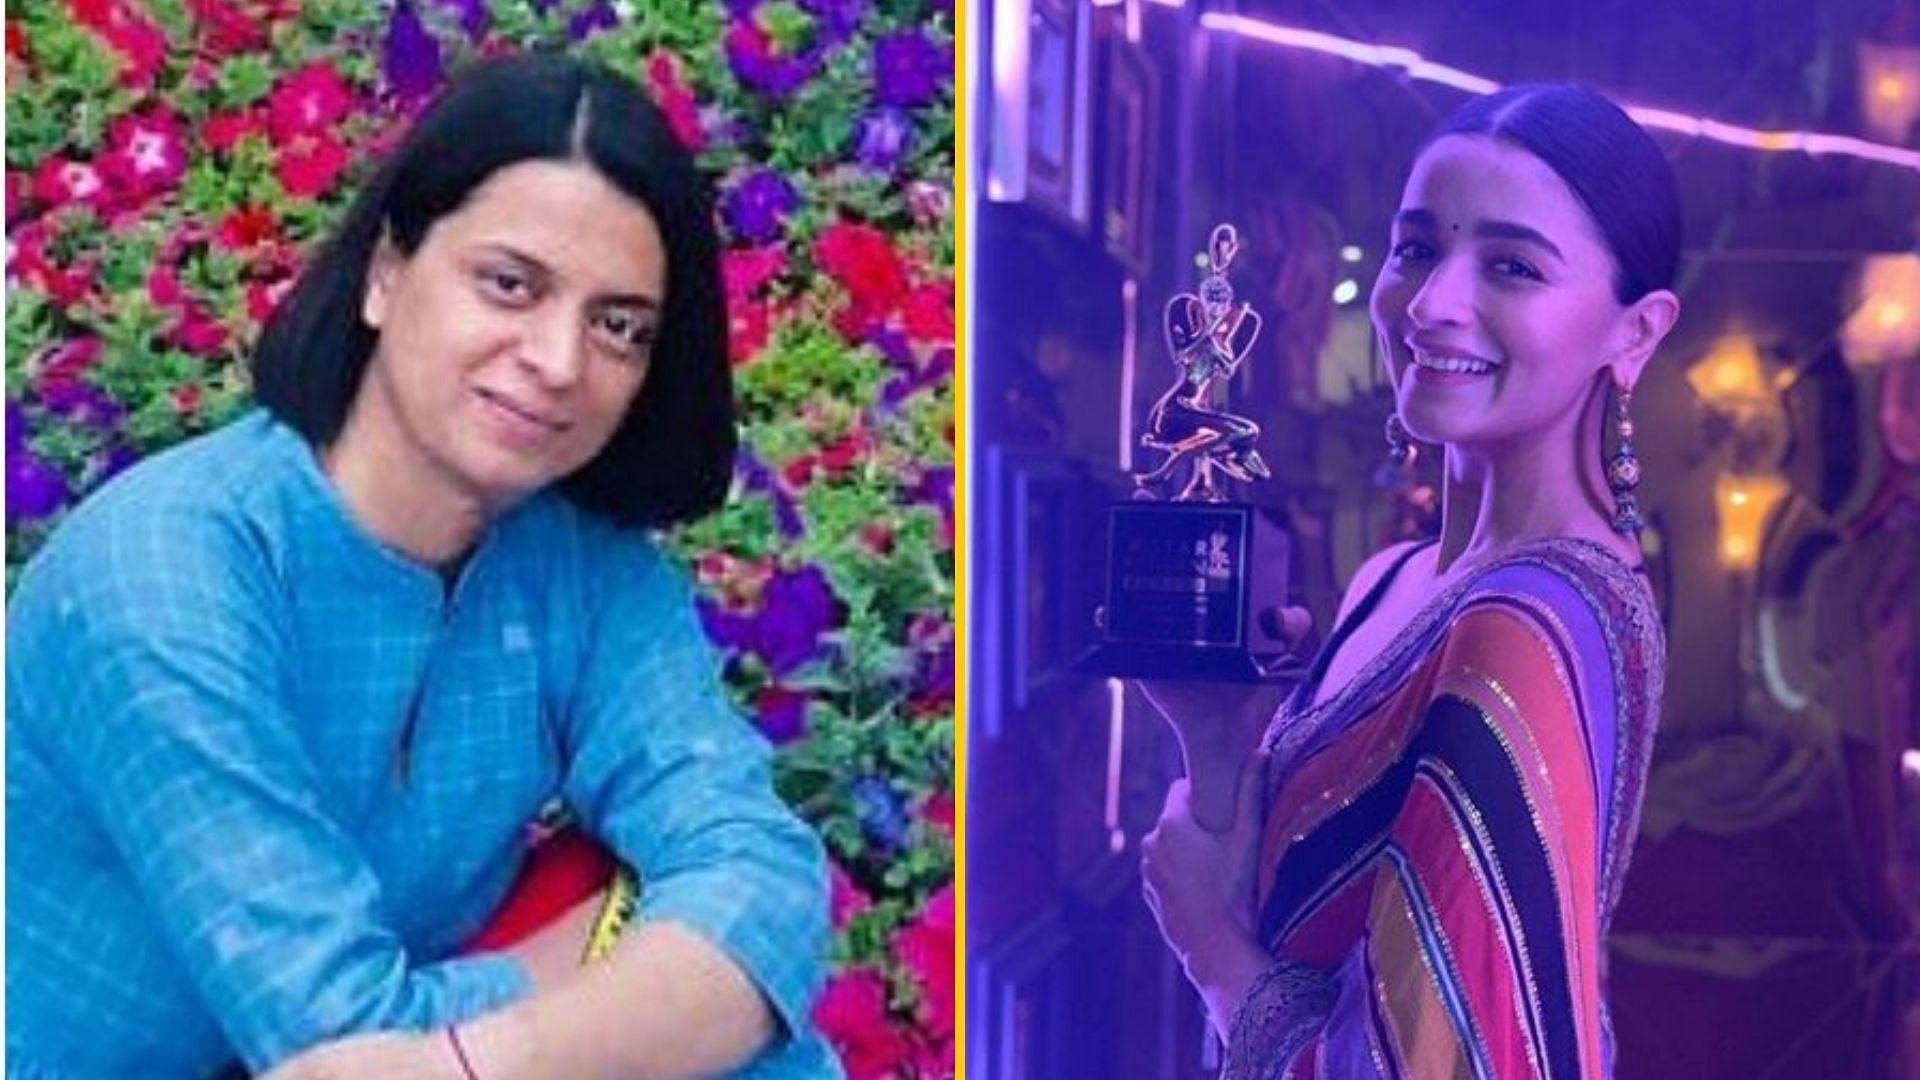 Did Alia Bhatt 'Fix' Her Award as Kangana's Sister is Alleging?